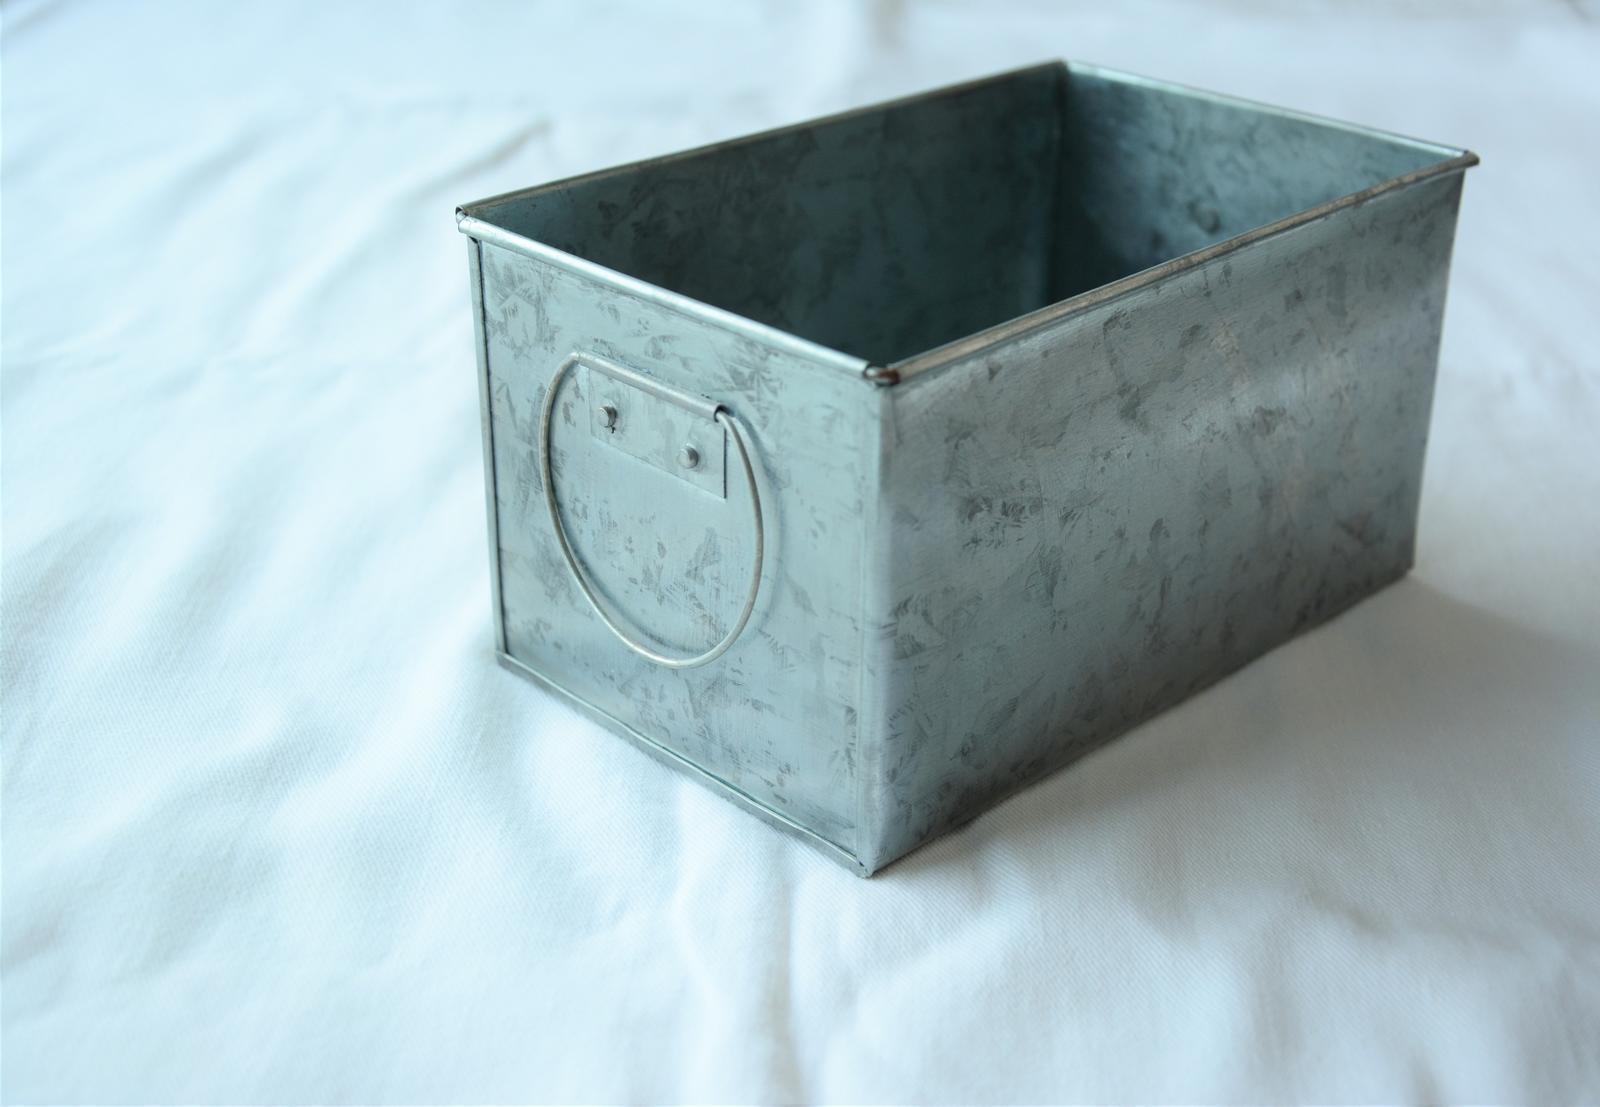 Dekoračná / aranžérska nádoba / dekorácia MADAM STOLZ - Obrázok č. 1